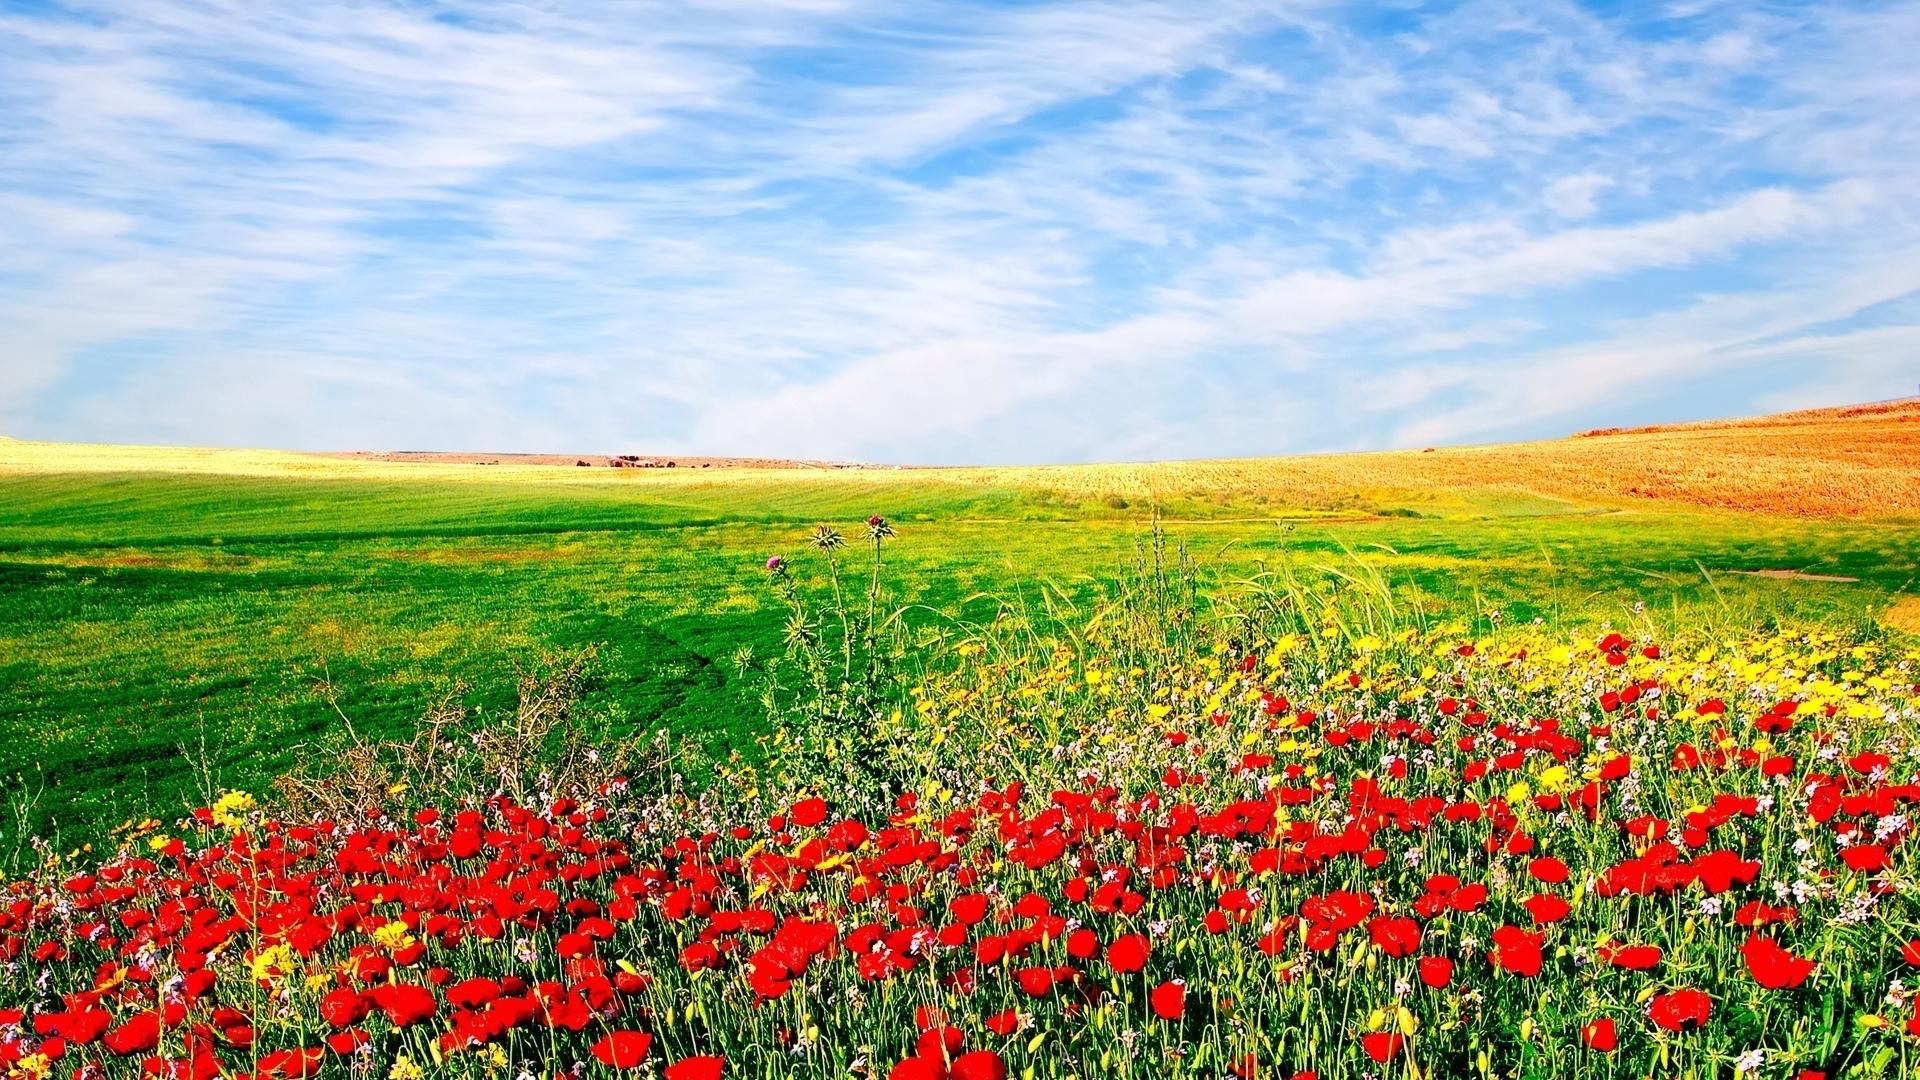 landscape photography flowers. garden design with flowers wallpapers wallpaperup for landscaping from wallpaperupcom landscape photography